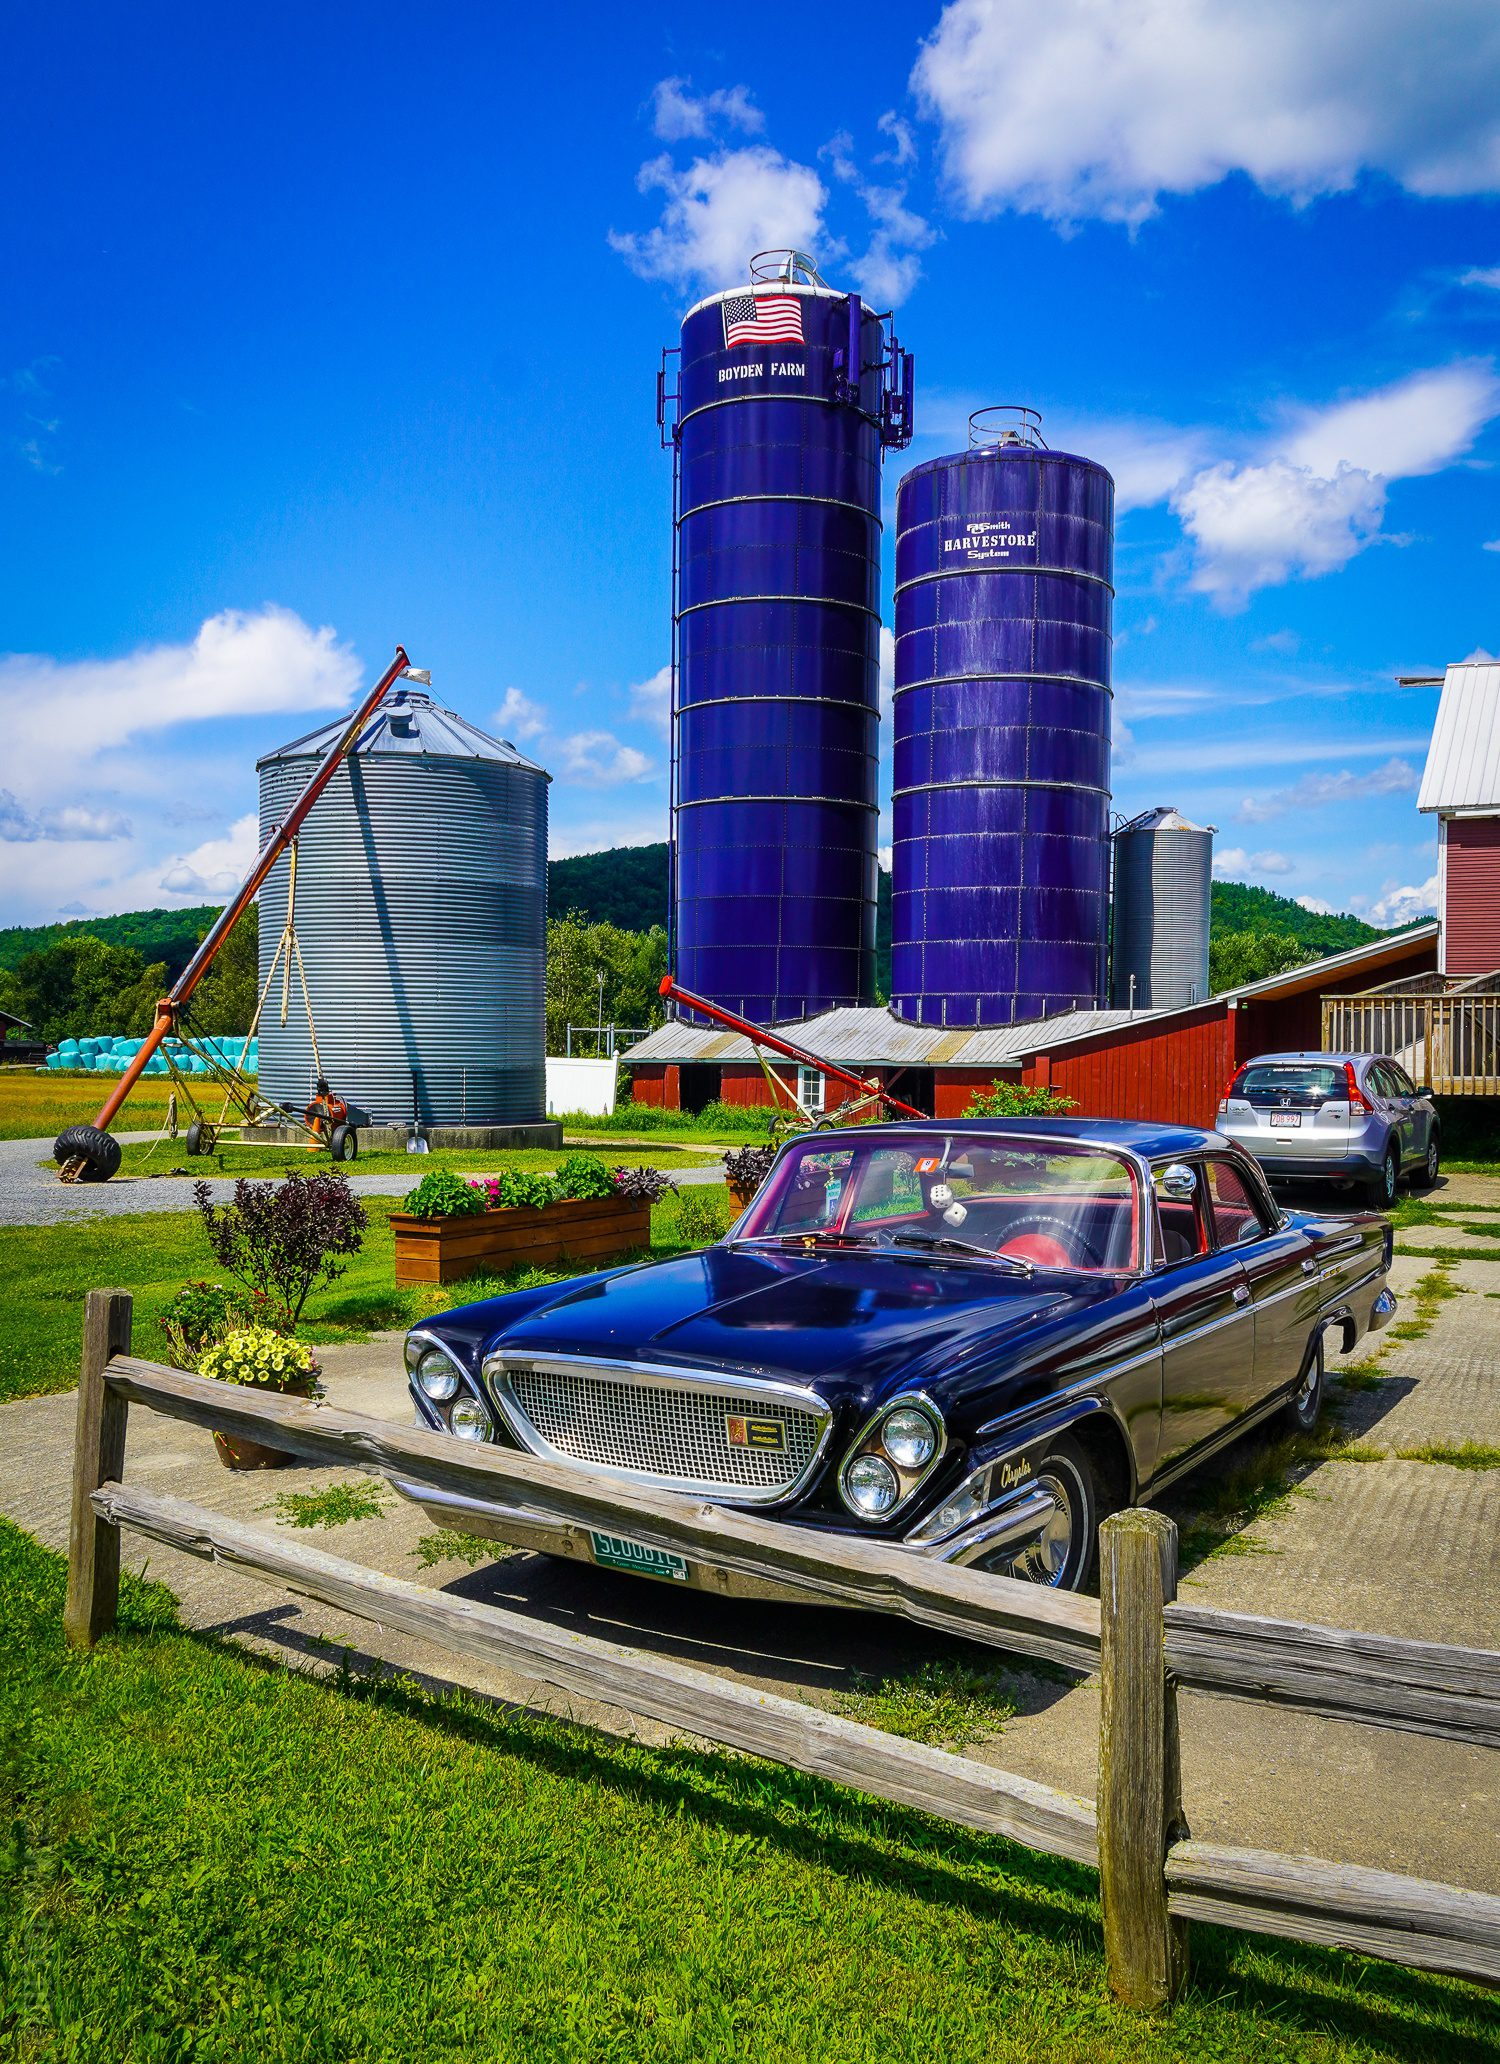 Farm barn wedding venue Vermont